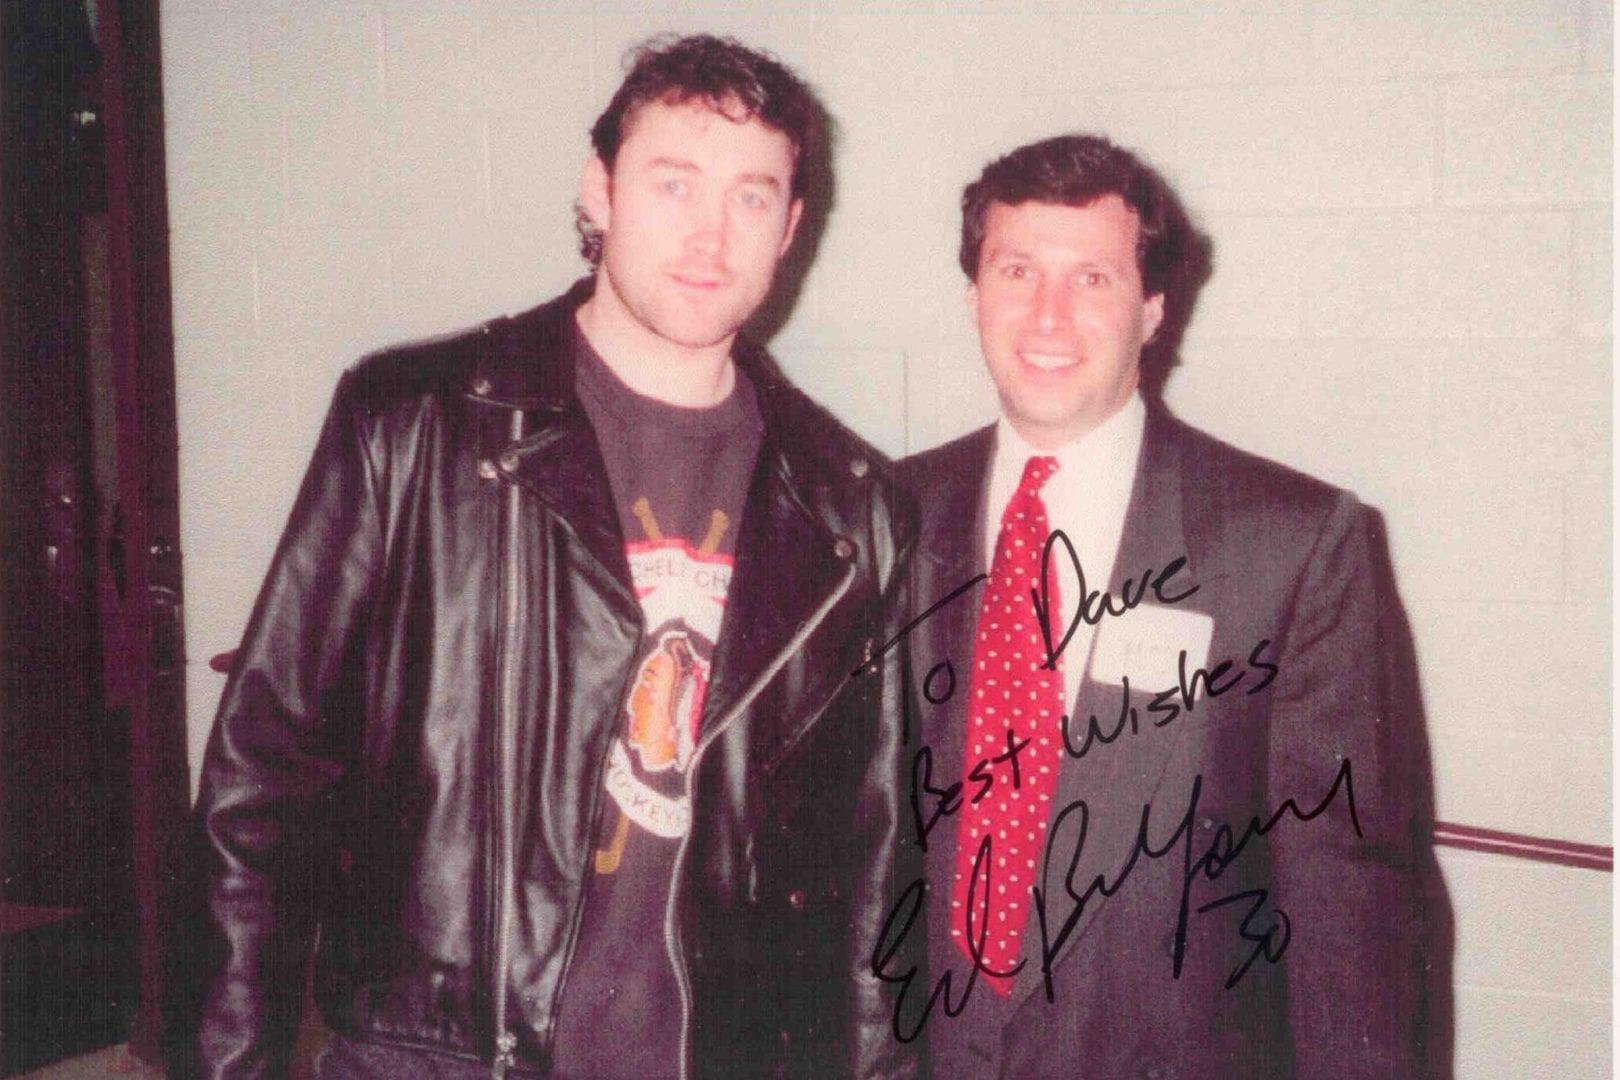 Ed Belfour autographed image